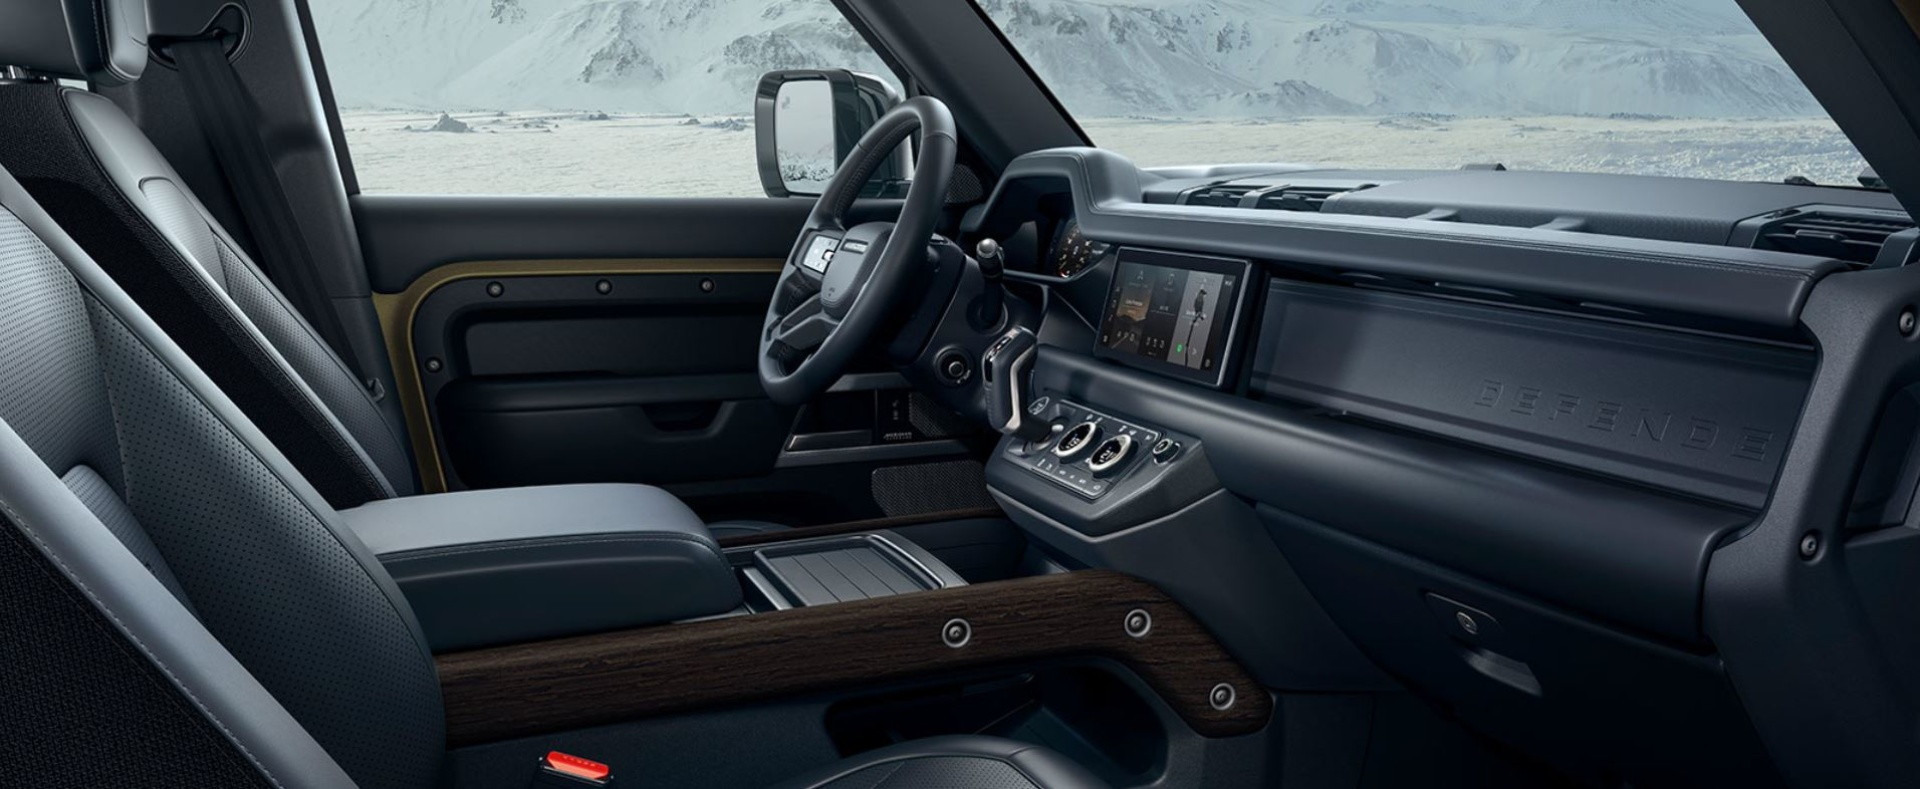 Land Rover-Land Rover Defender 110-1